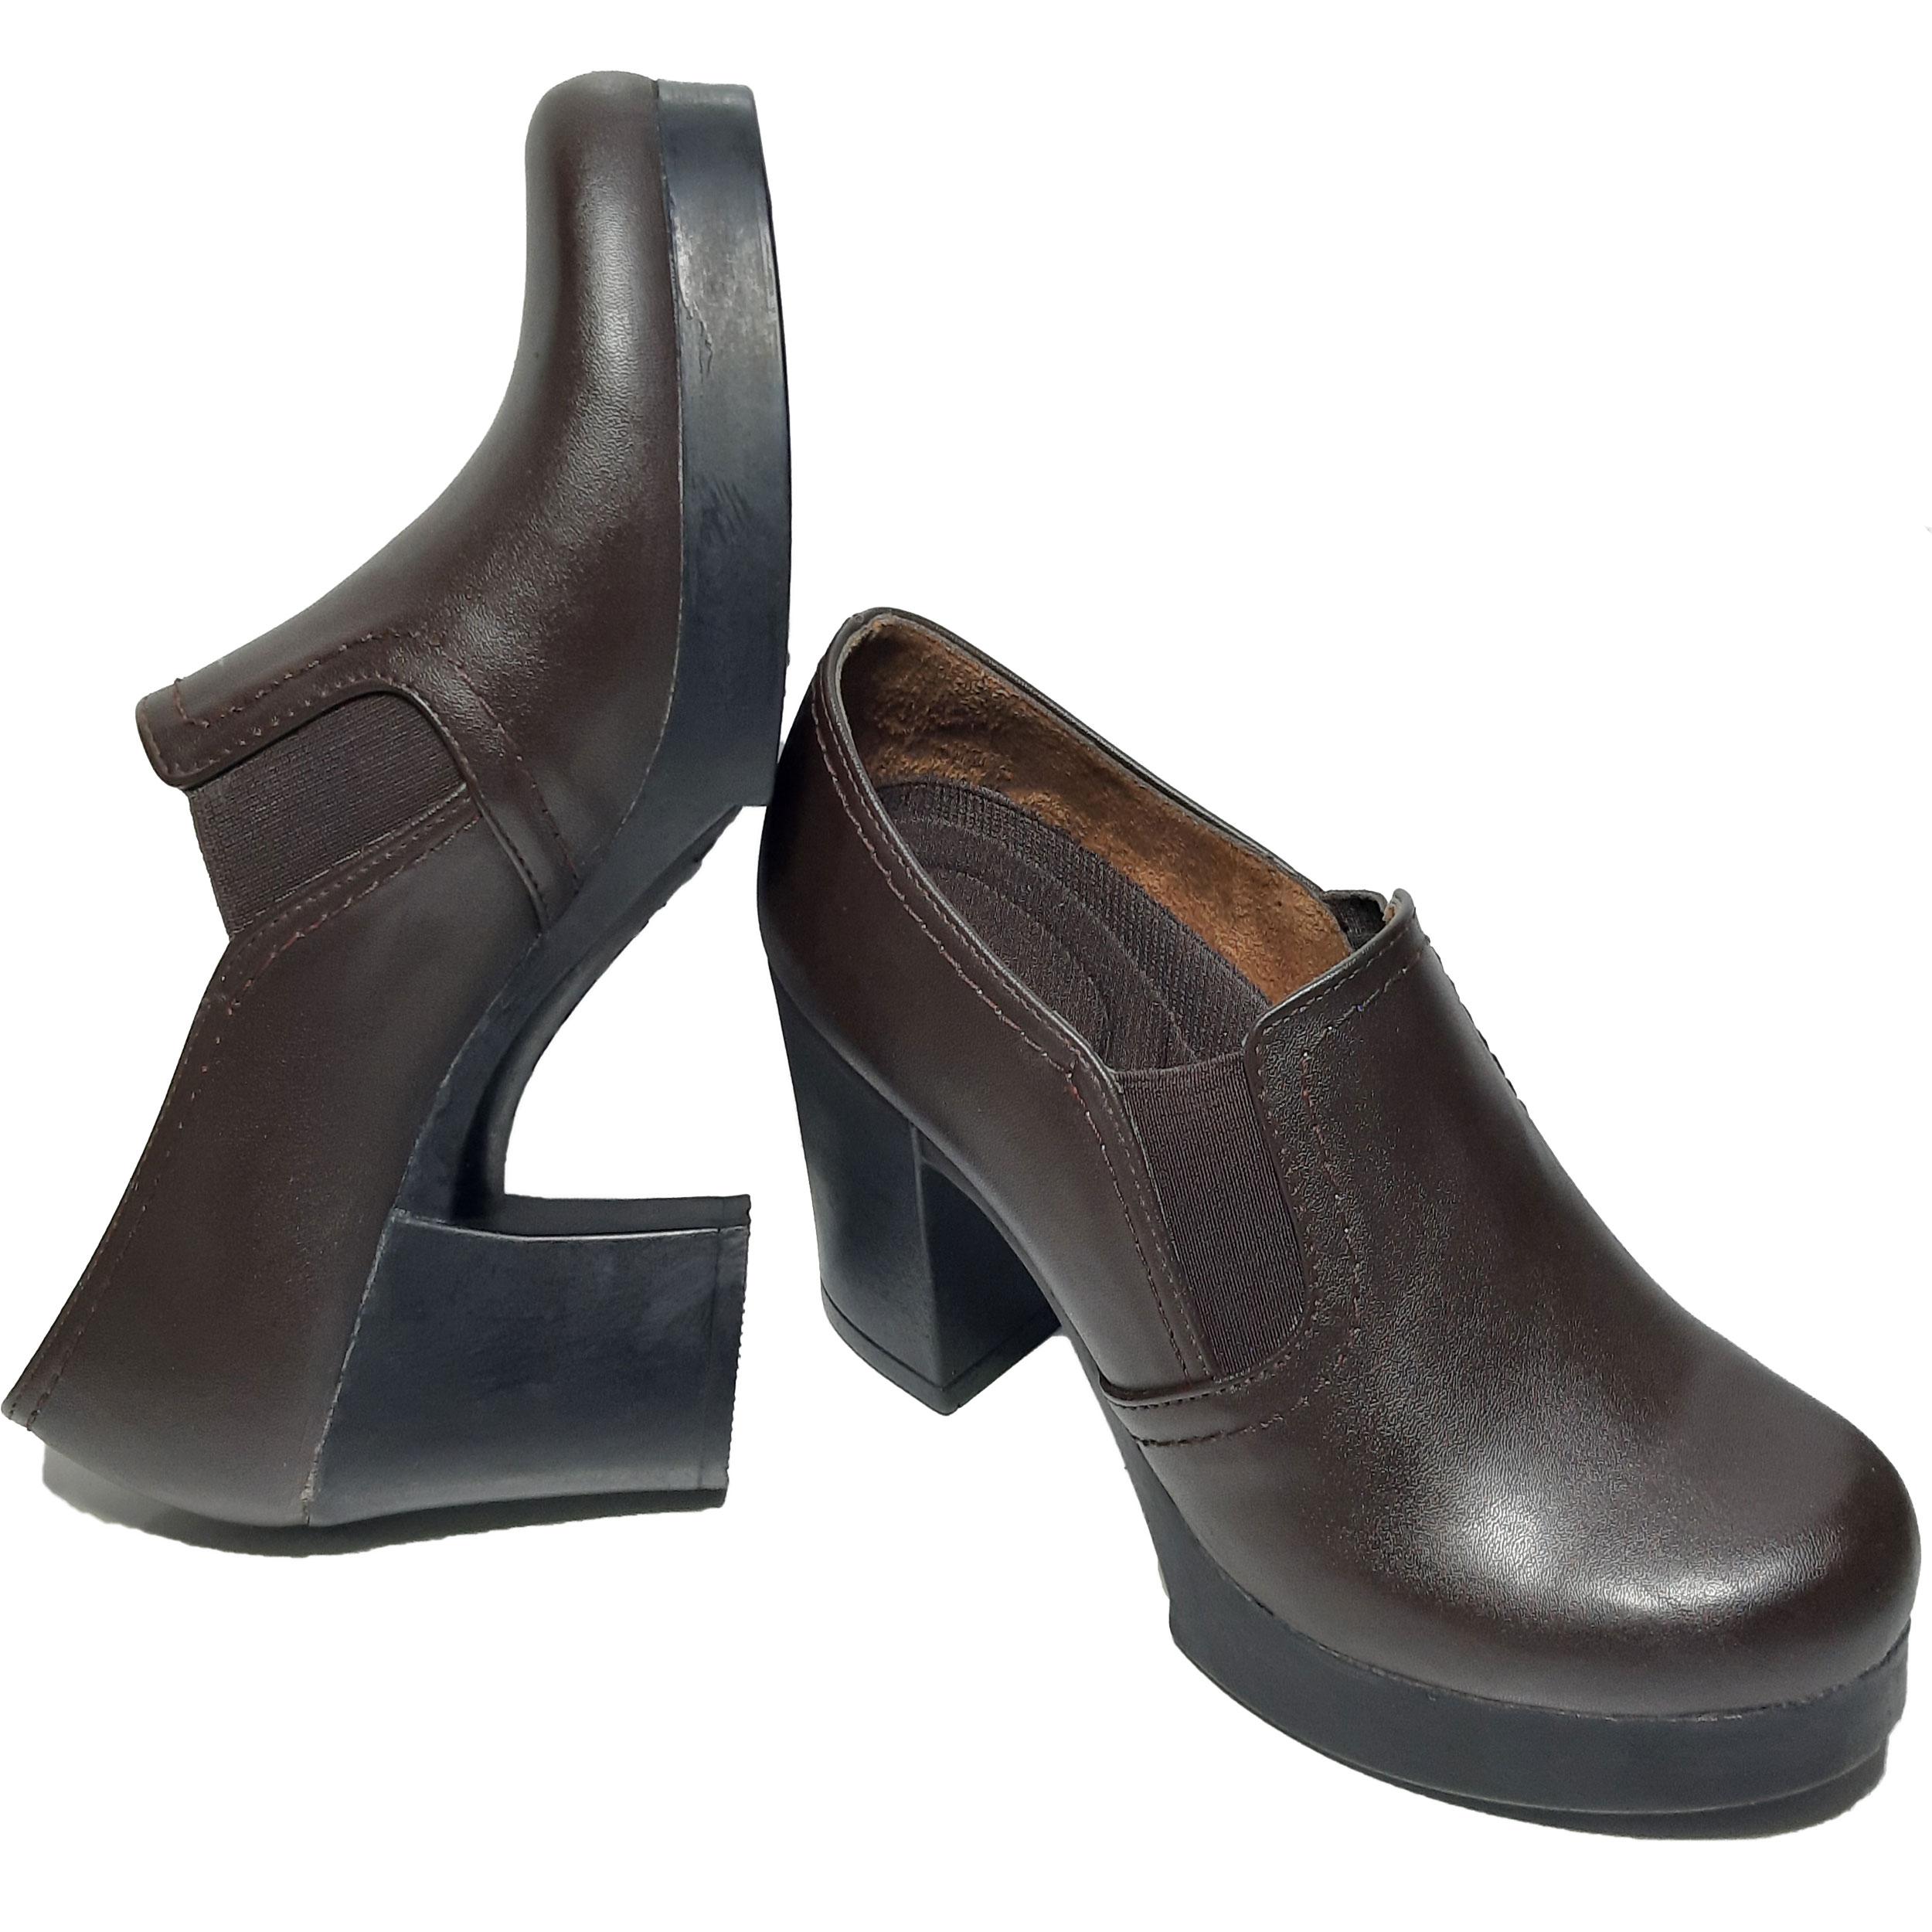 کفش زنانه مدل پرنس -  - 3